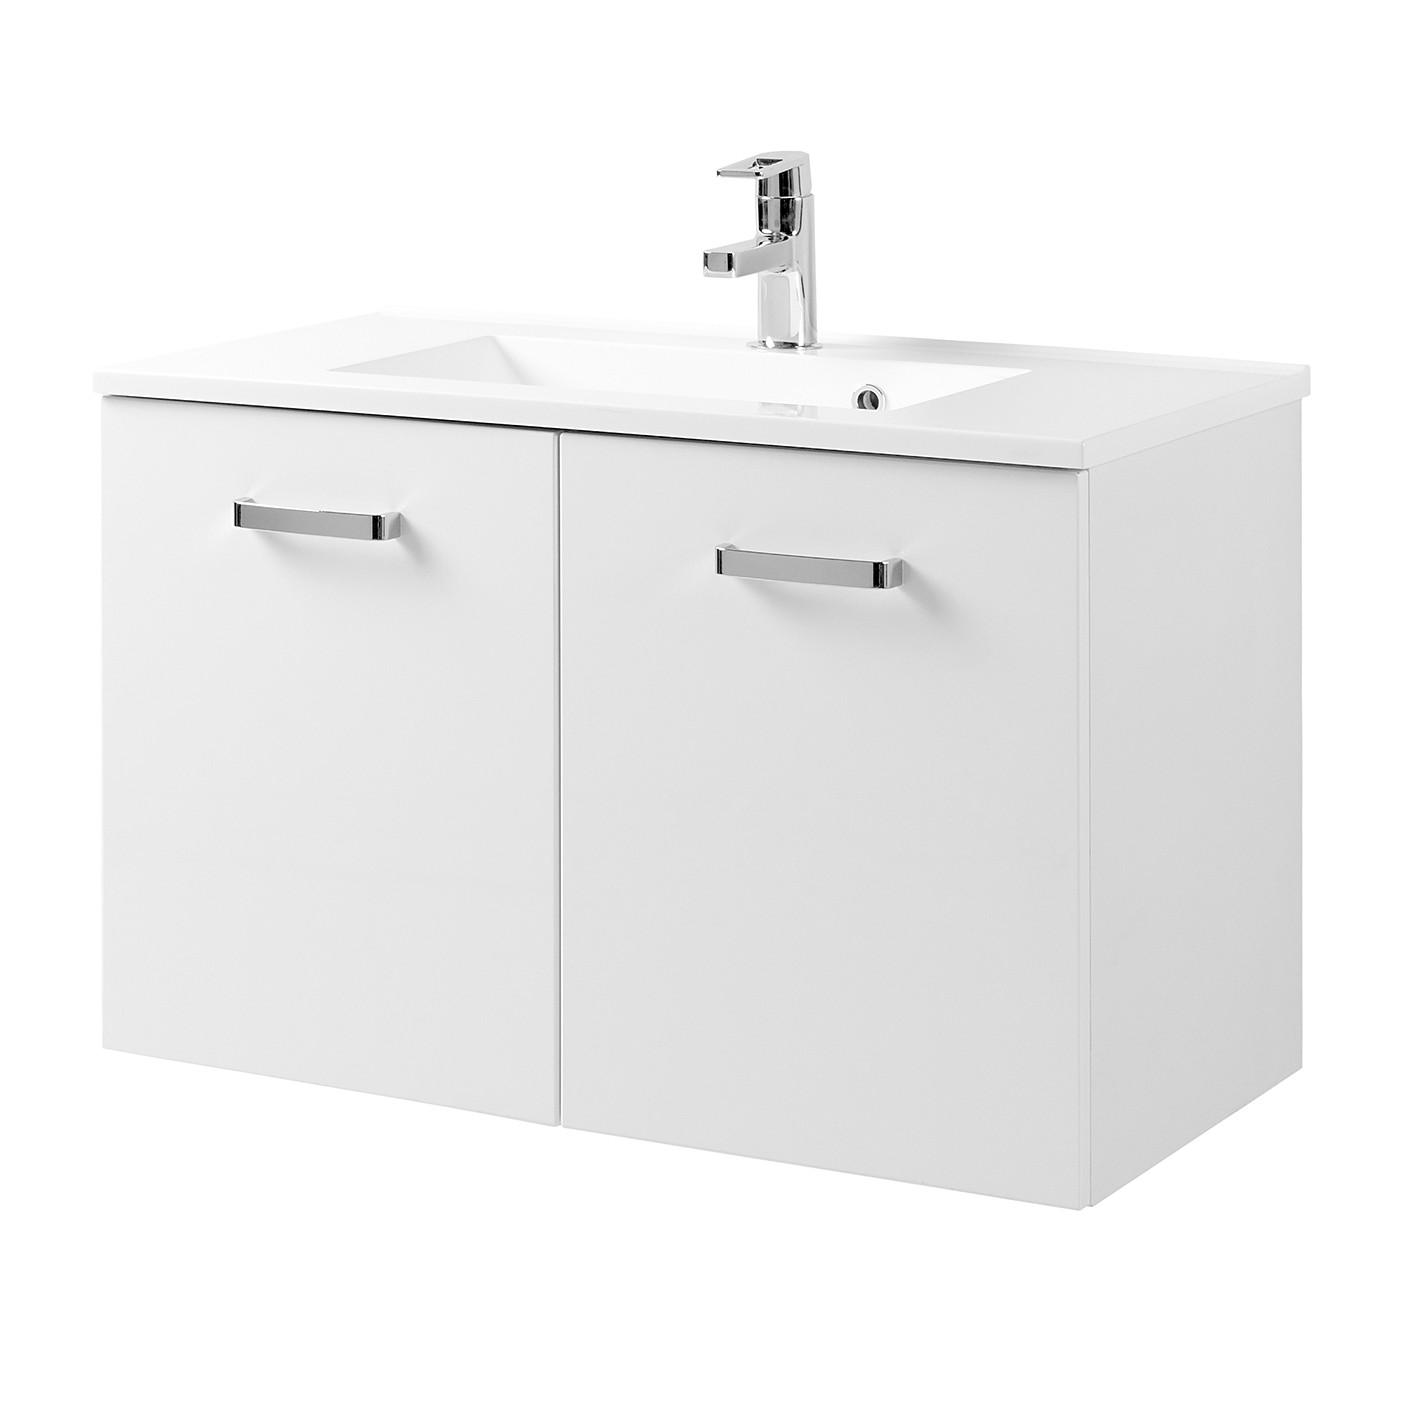 Mobile lavabo Zeehan - Bianco - 80 cm, Giessbach